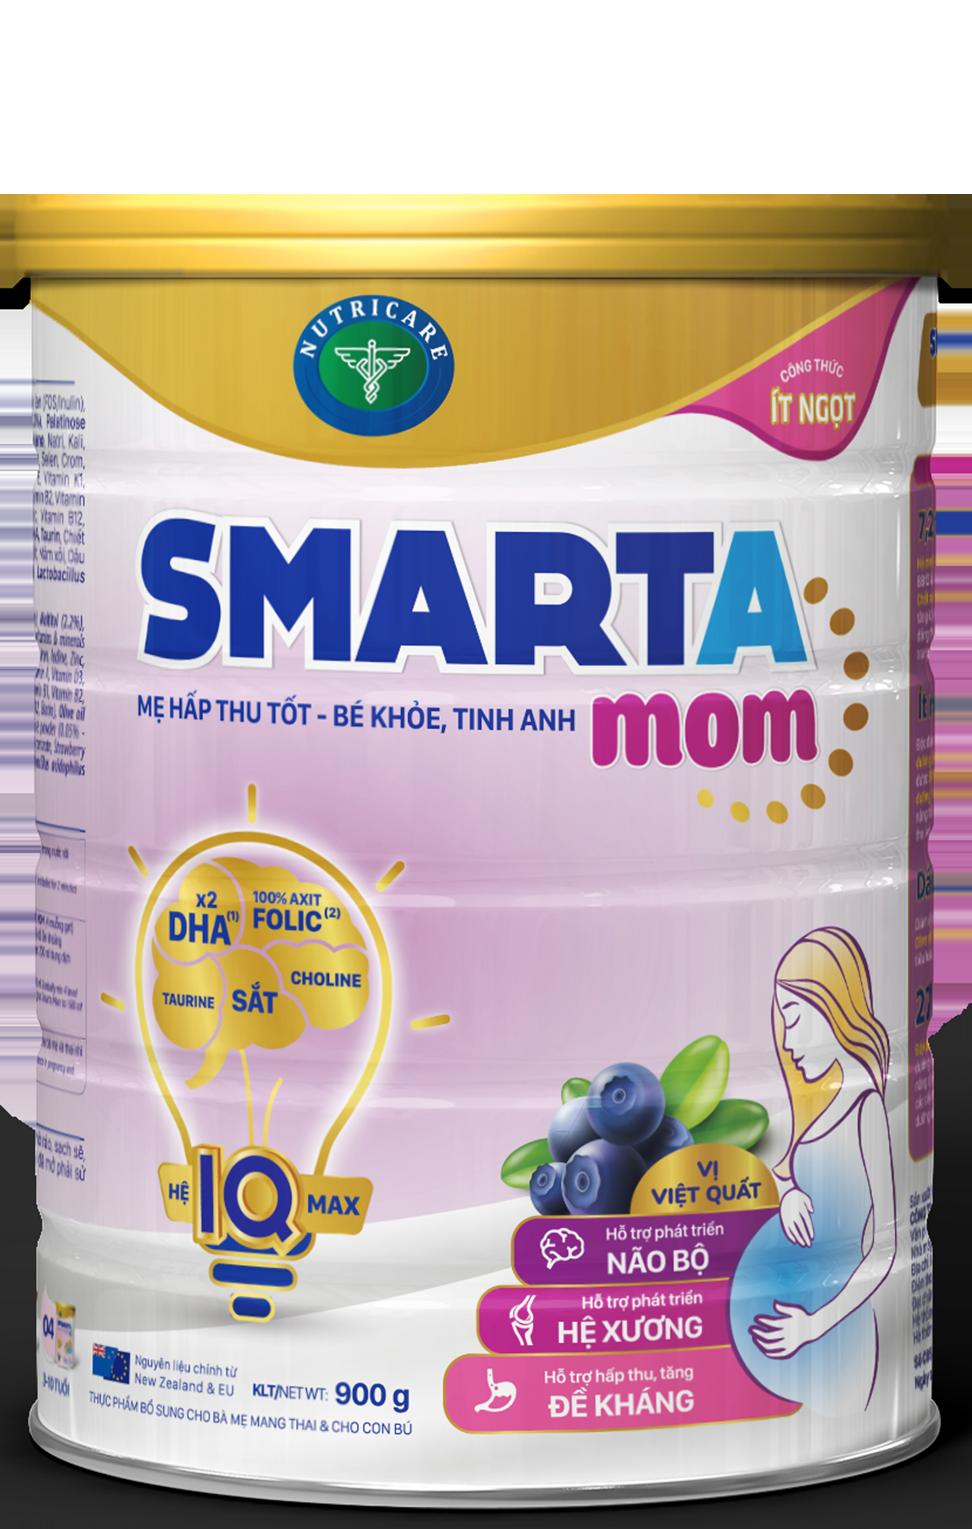 SMARTA MOM VỊ VIỆT QUẤT